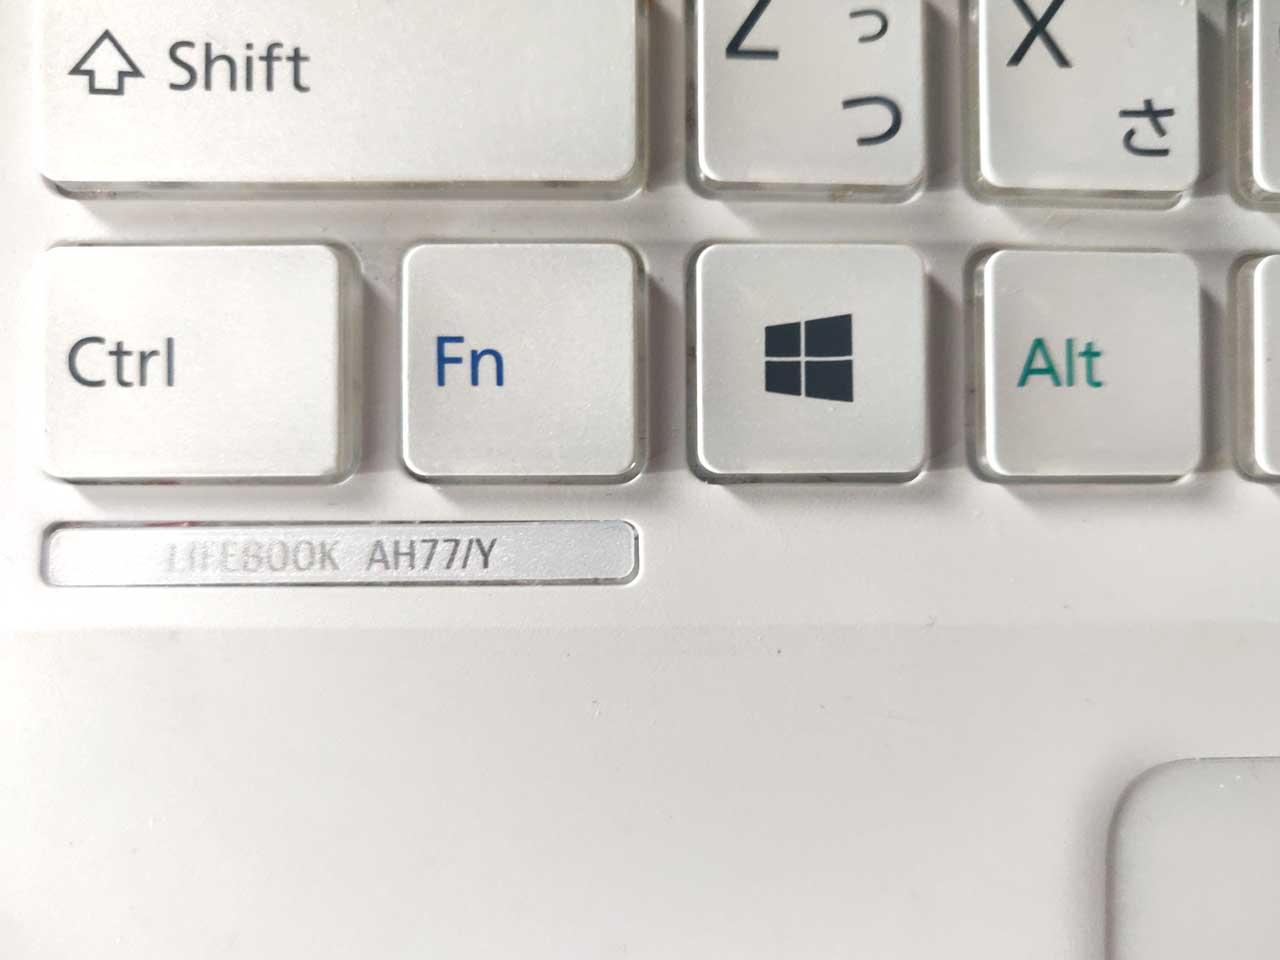 LIFEBOOK AH77/Y キーボードのロゴ